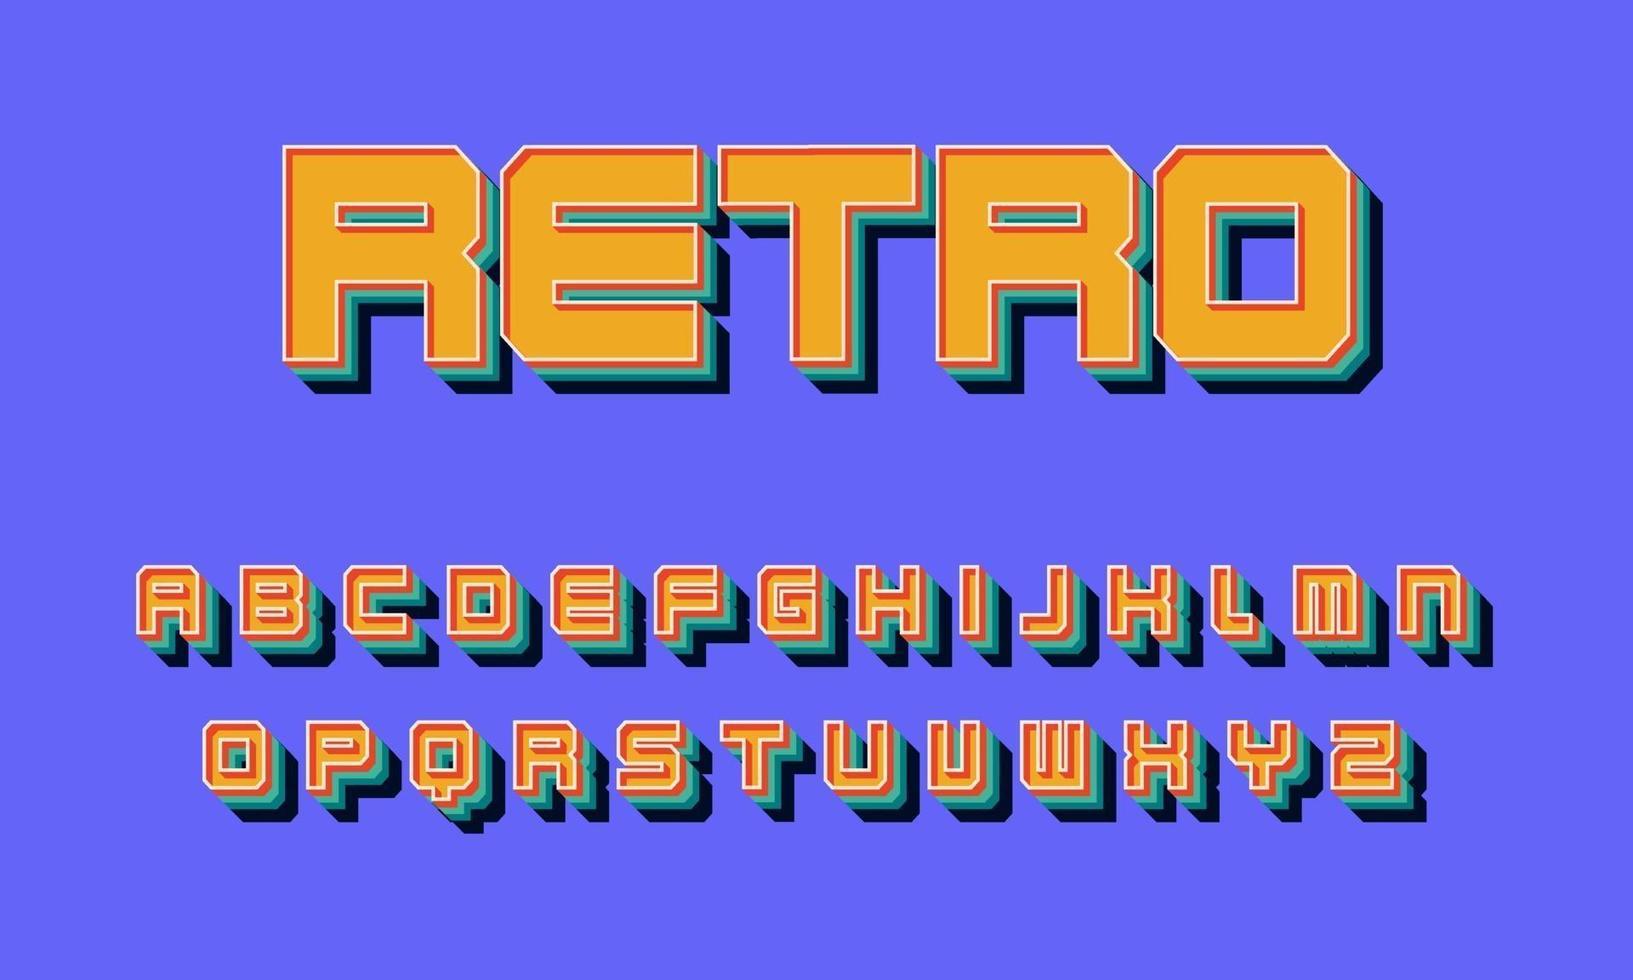 Vector of Stylized Retro Font Alphabet